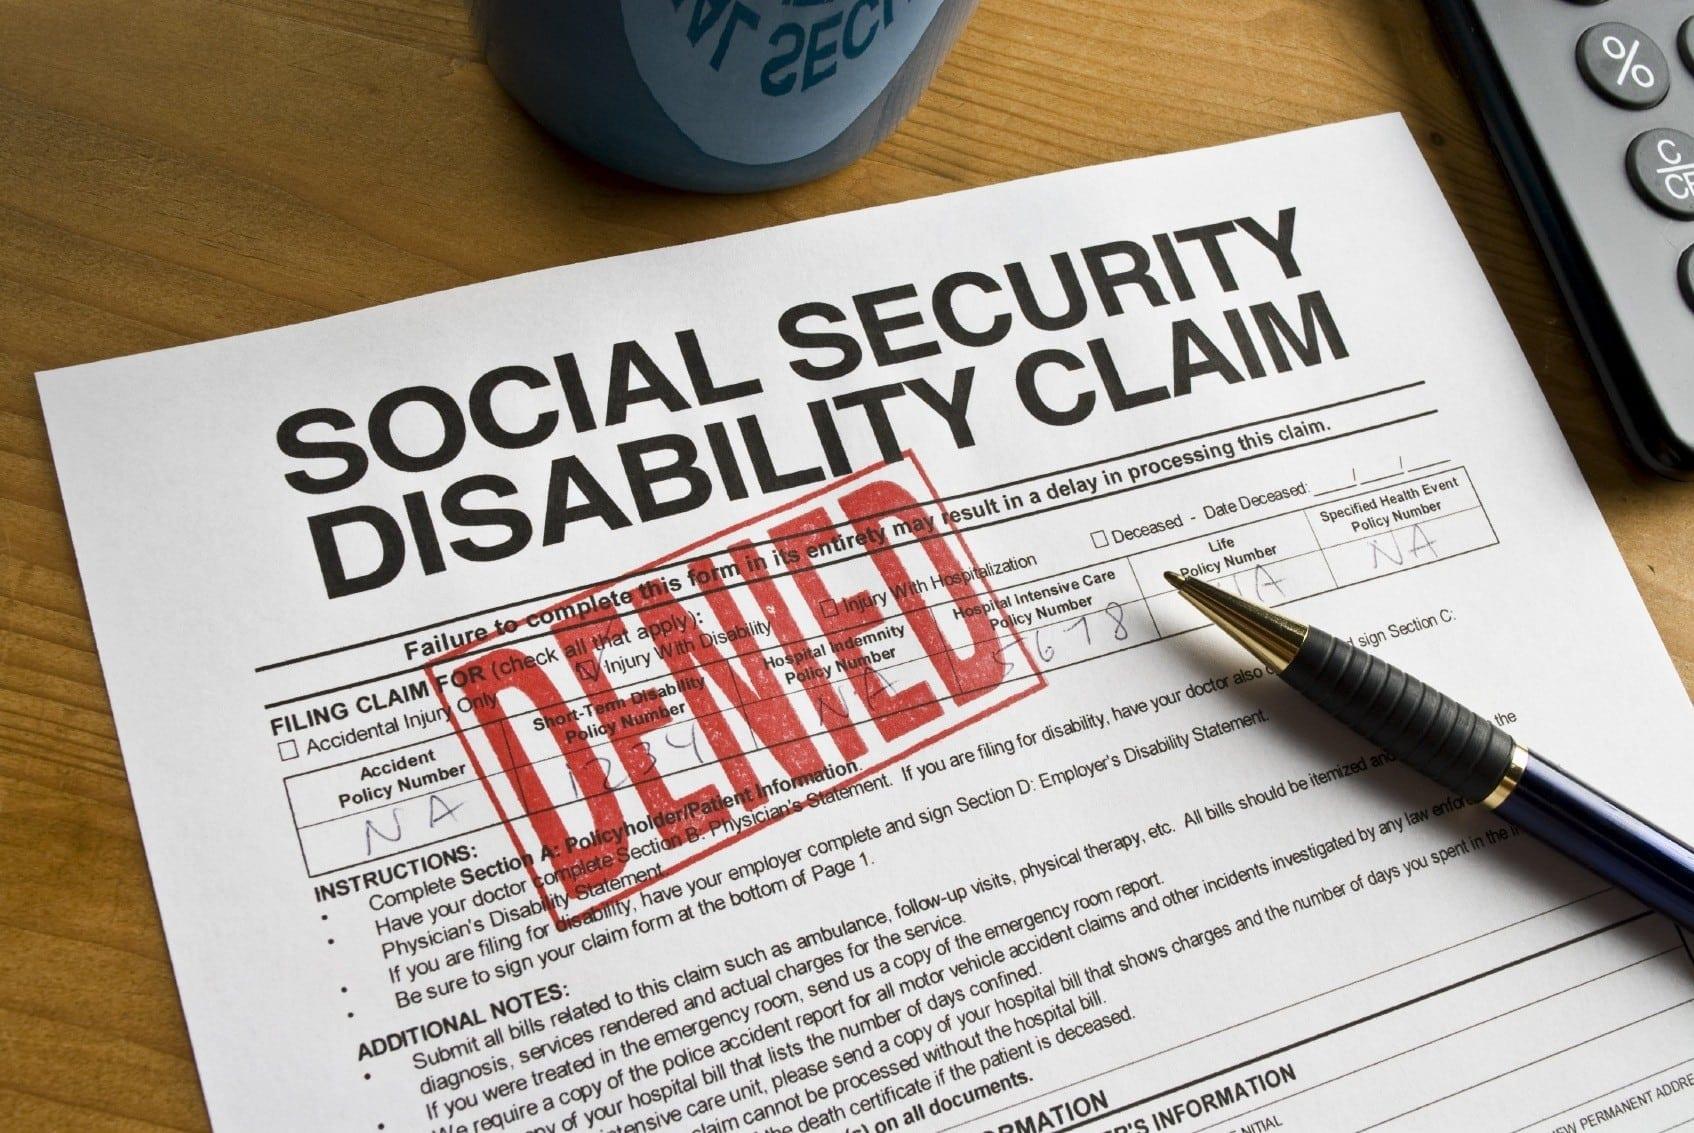 Social Security Disability Claim Denied Stock Photo